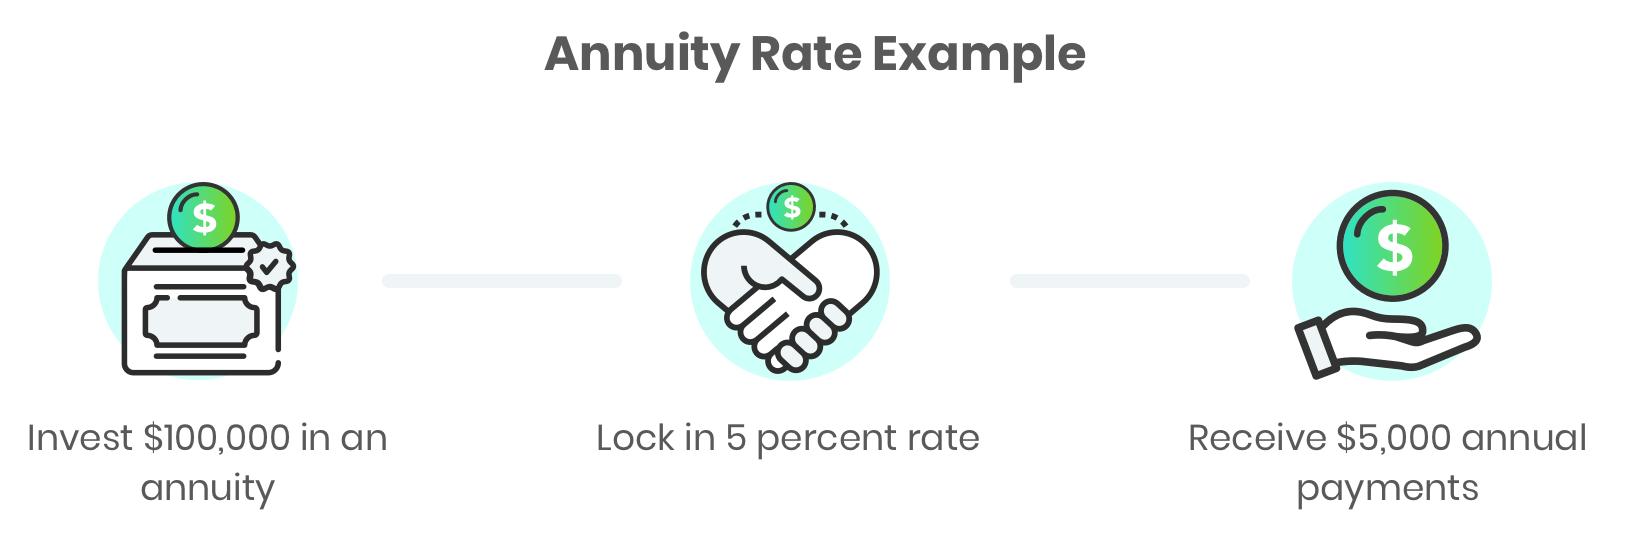 annuity rates factors comparisons calculations formulas